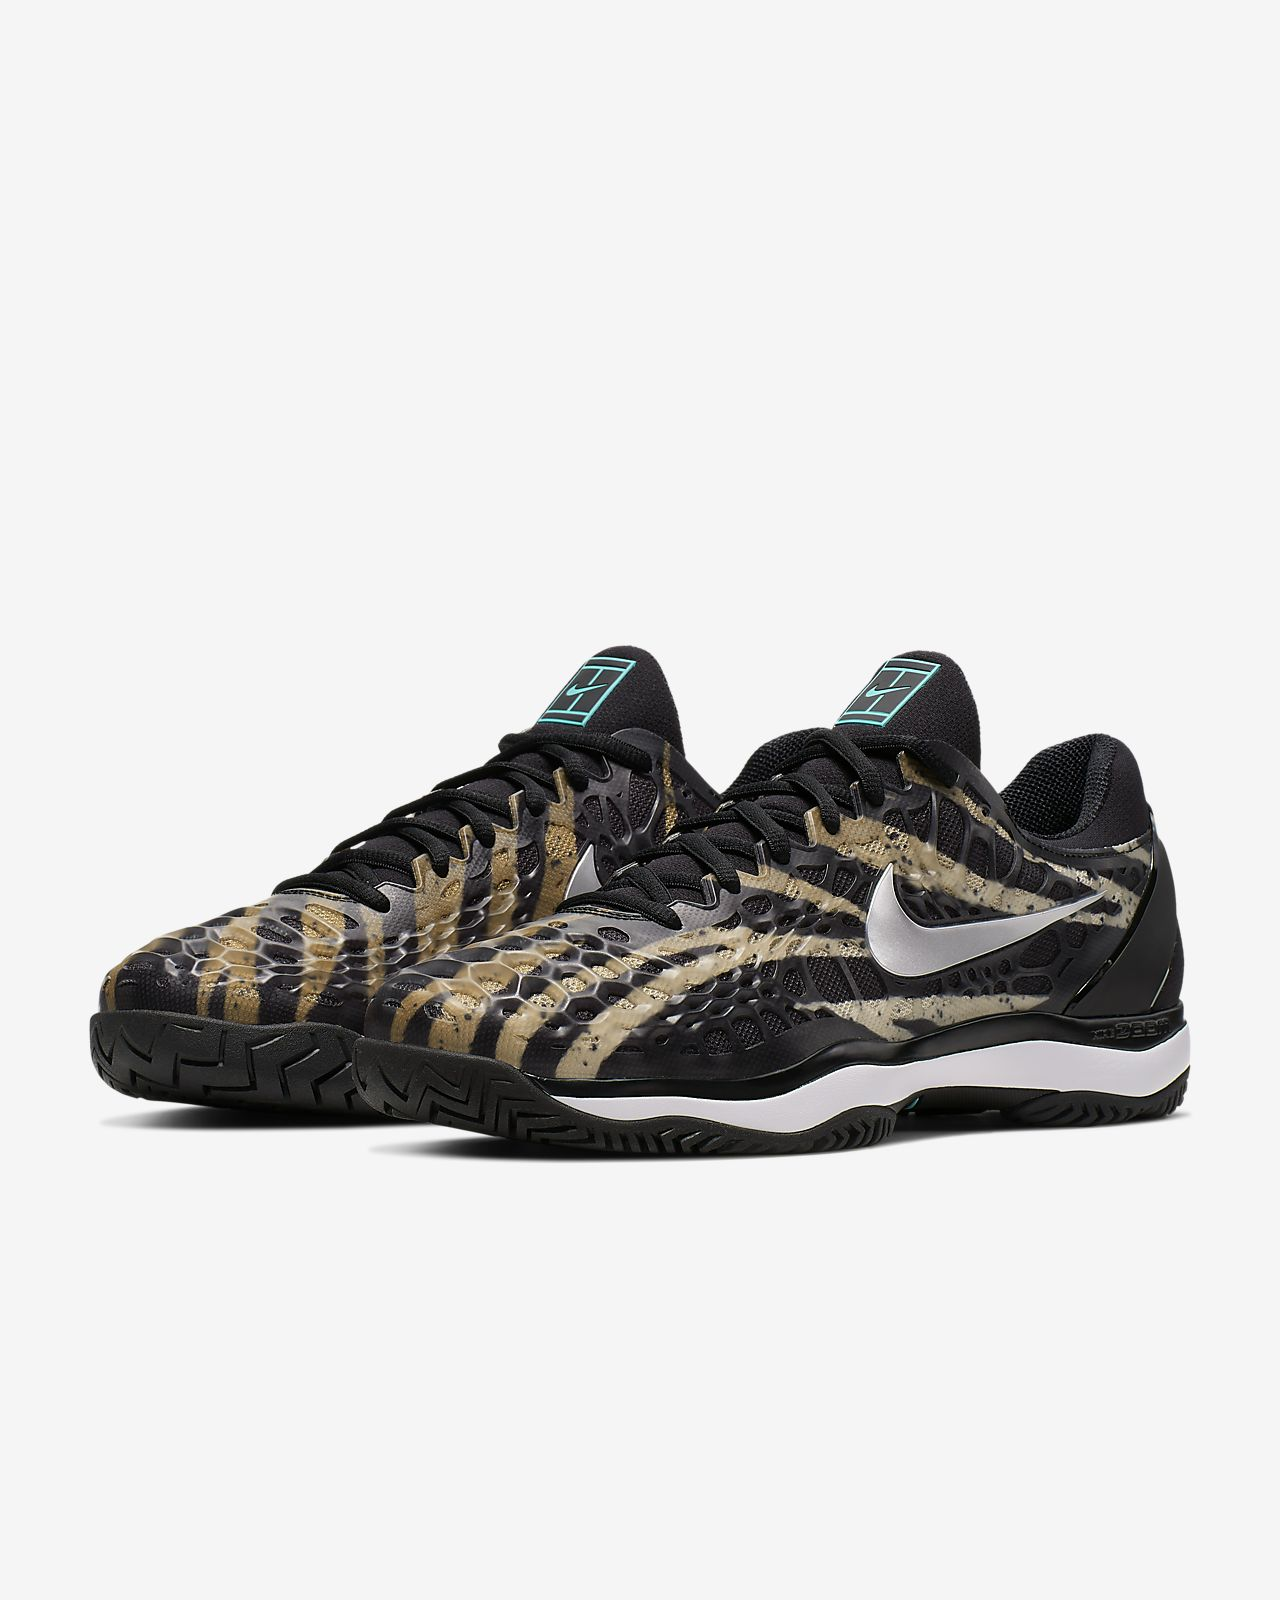 Nike Zoom Cage 3 Mens Tennis Shoe, 918193 044